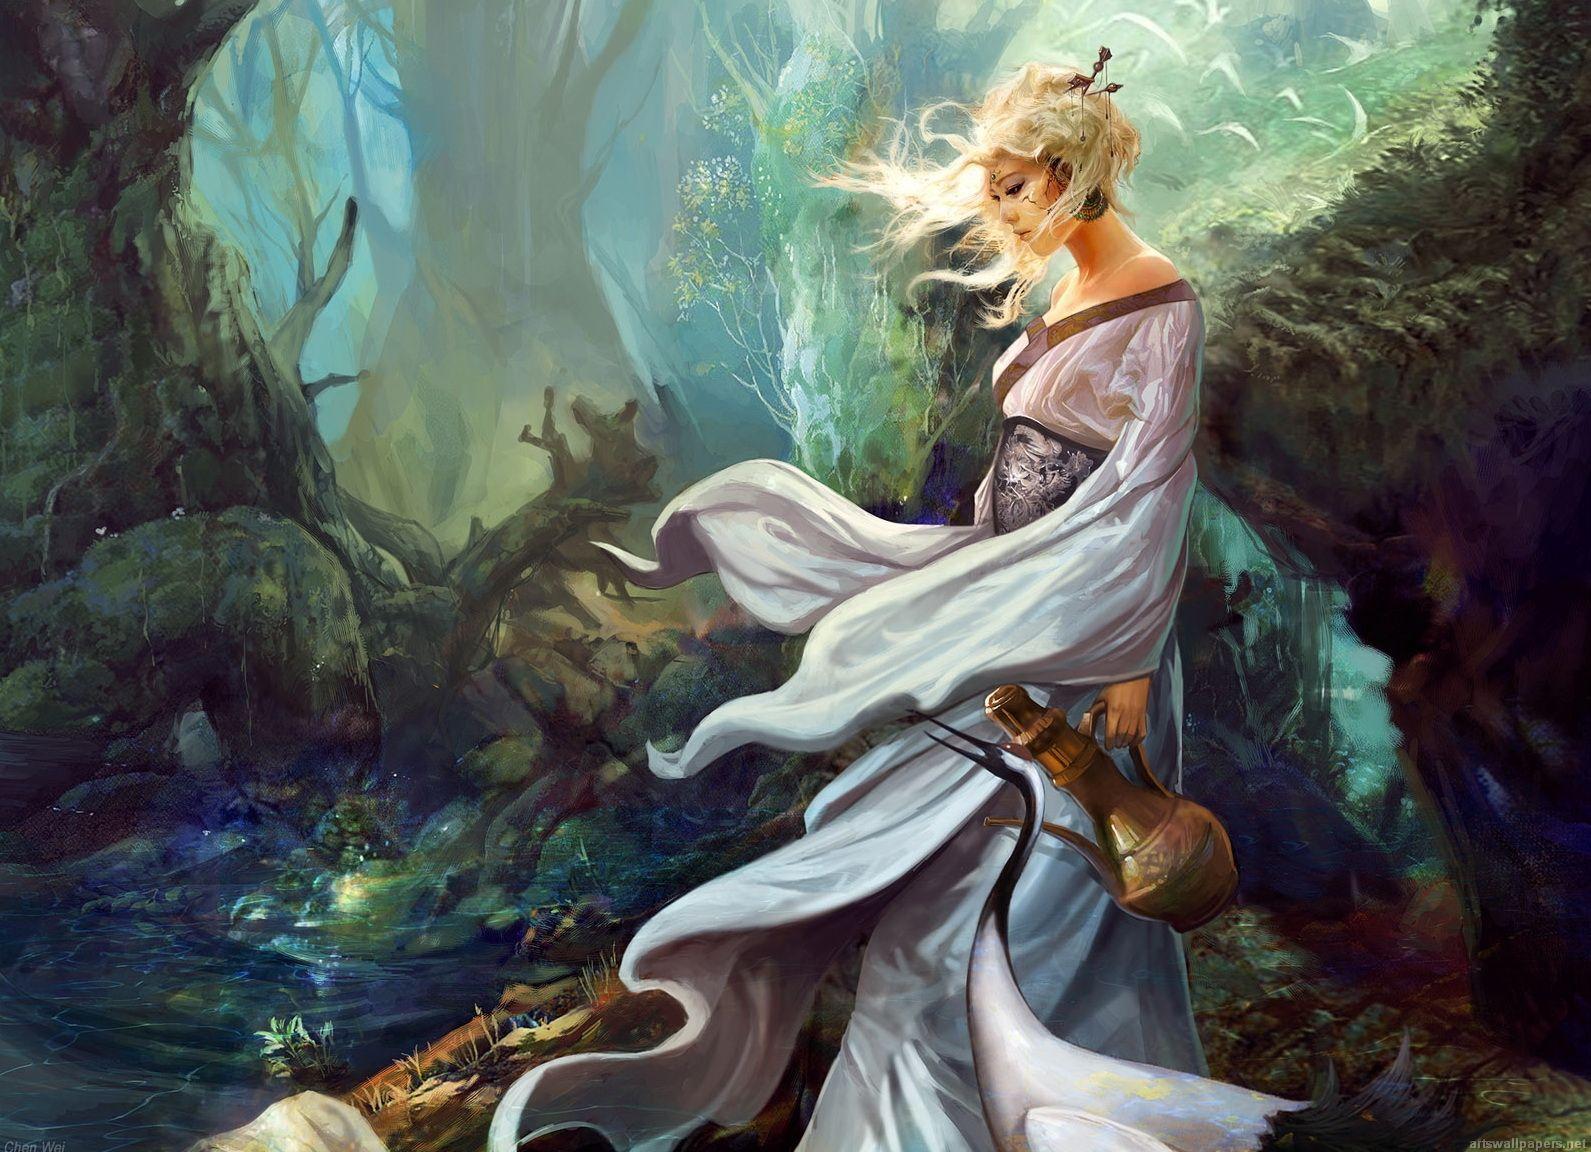 fantasy   Fantasy Wallpapers, Girls, CG, Art, Fantasy Creatures Wallpapers ...